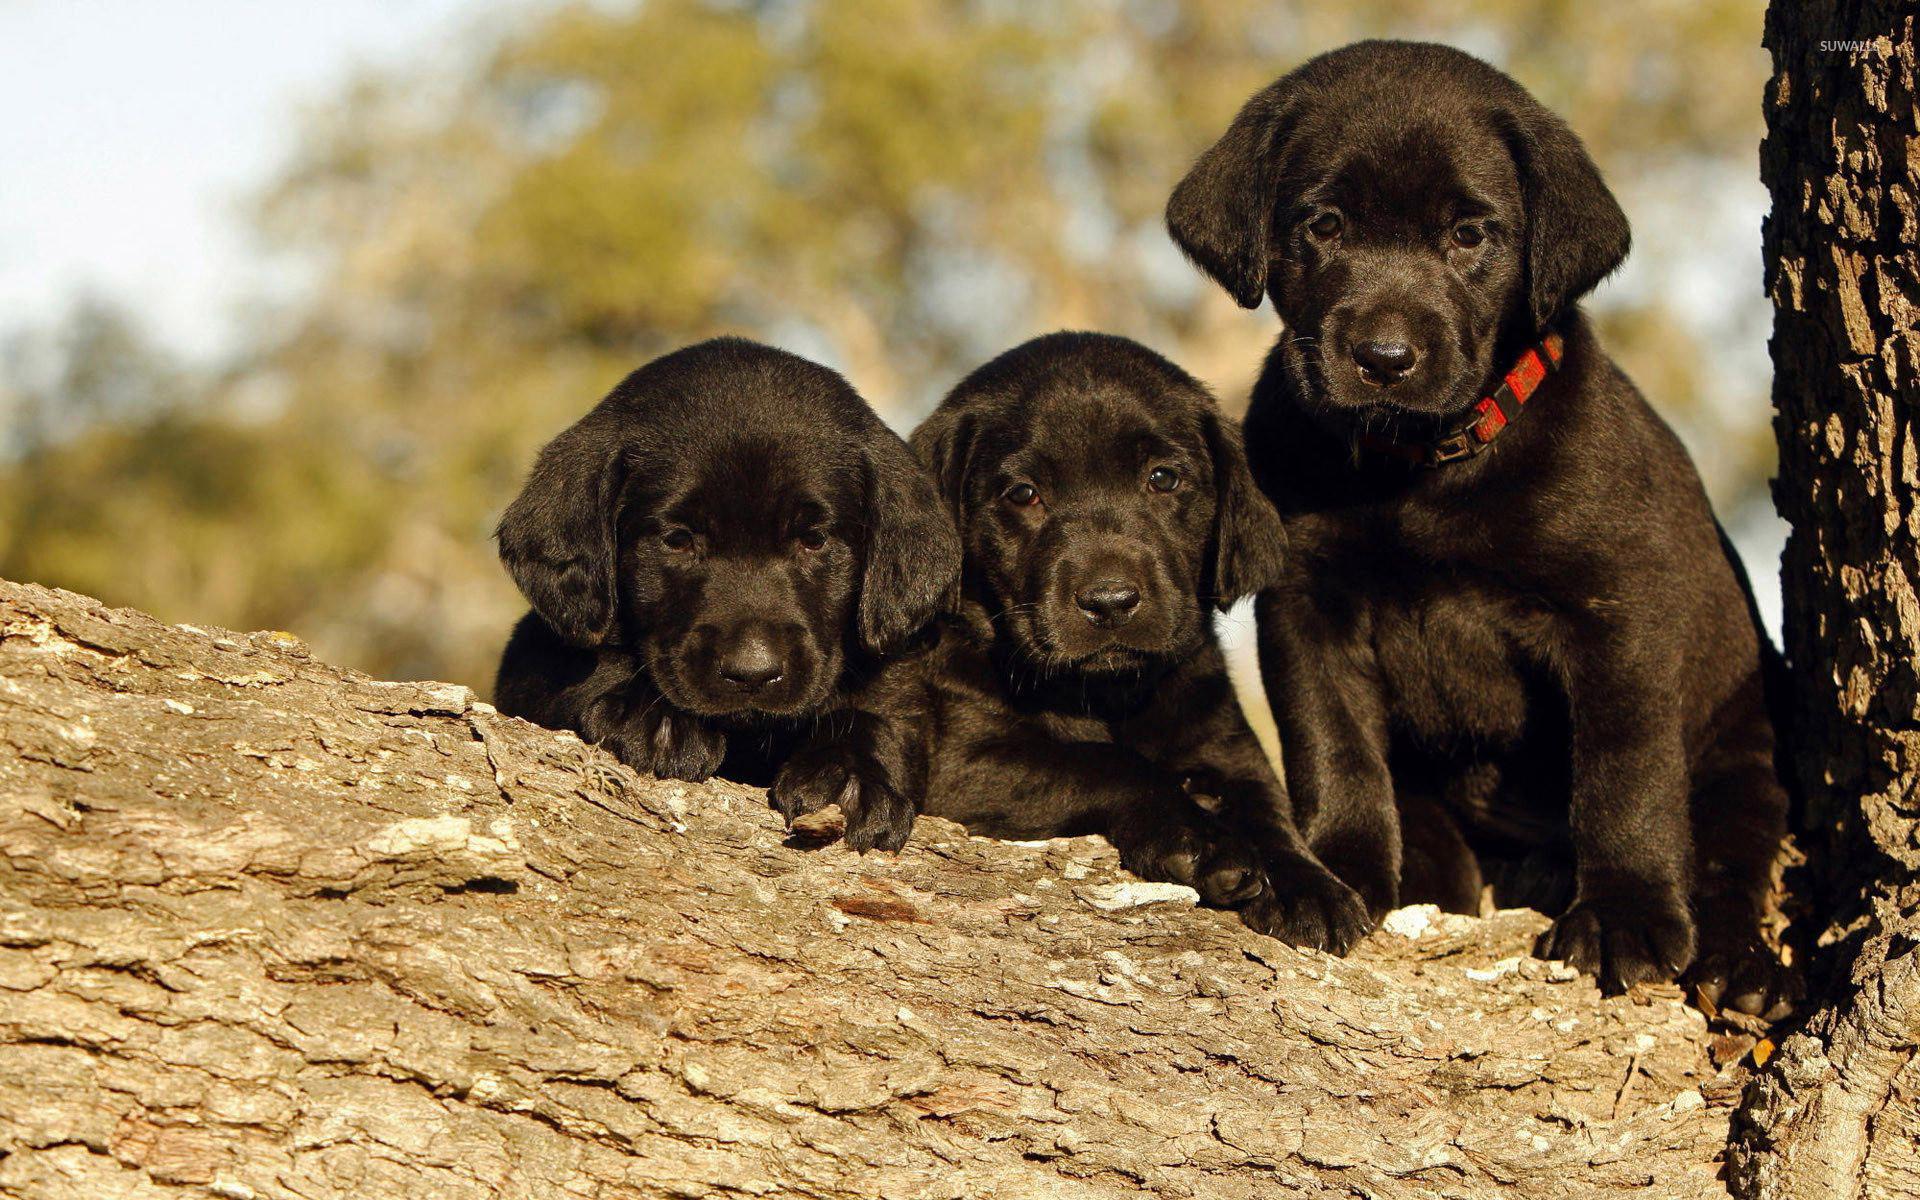 Black Labrador puppies in a tree wallpaper jpg